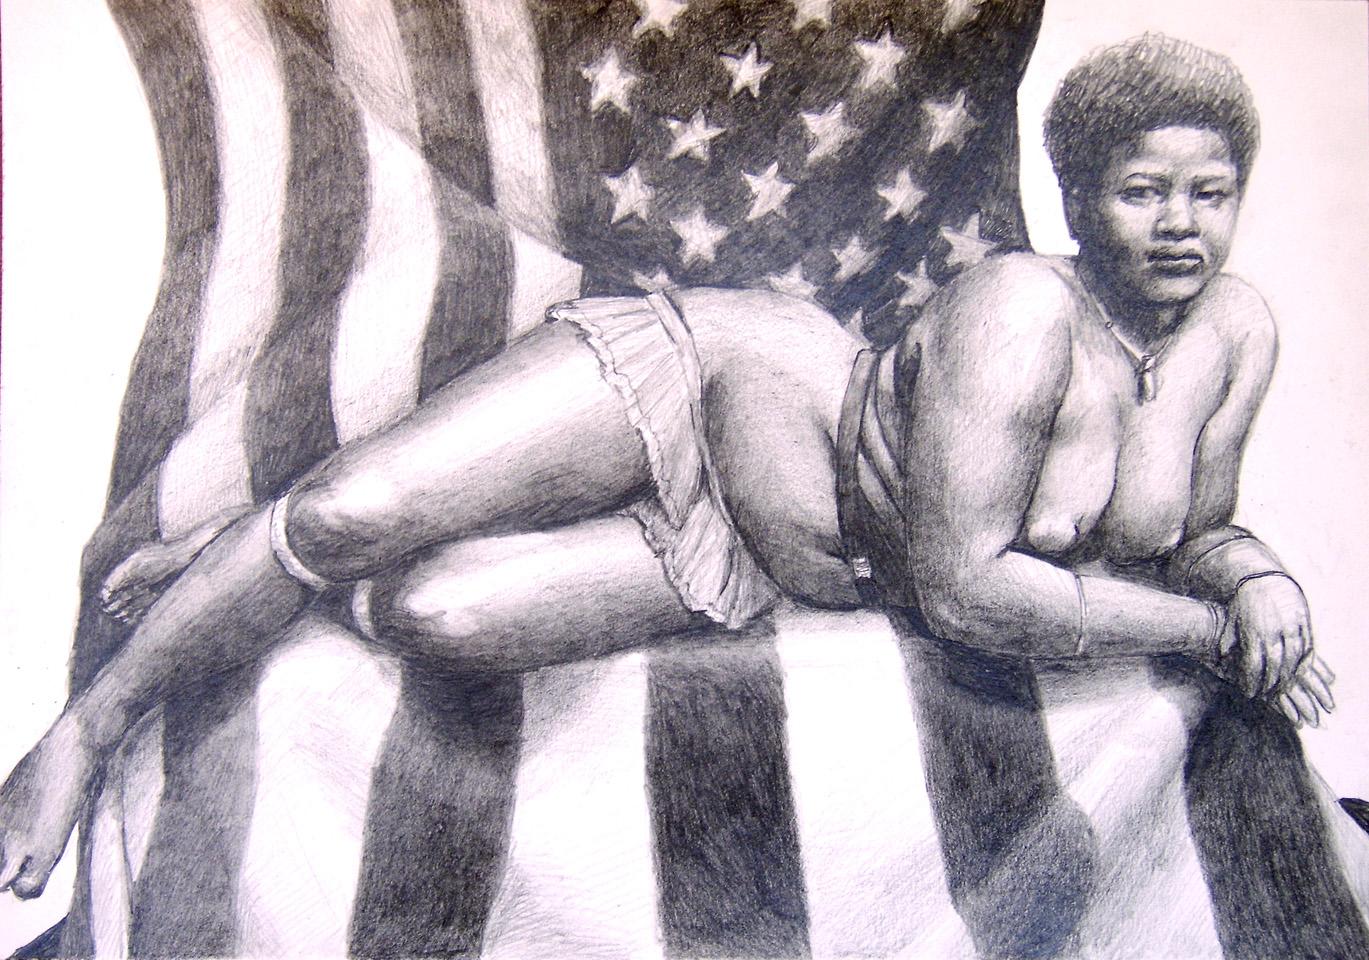 erotic pencil drawings of african americans